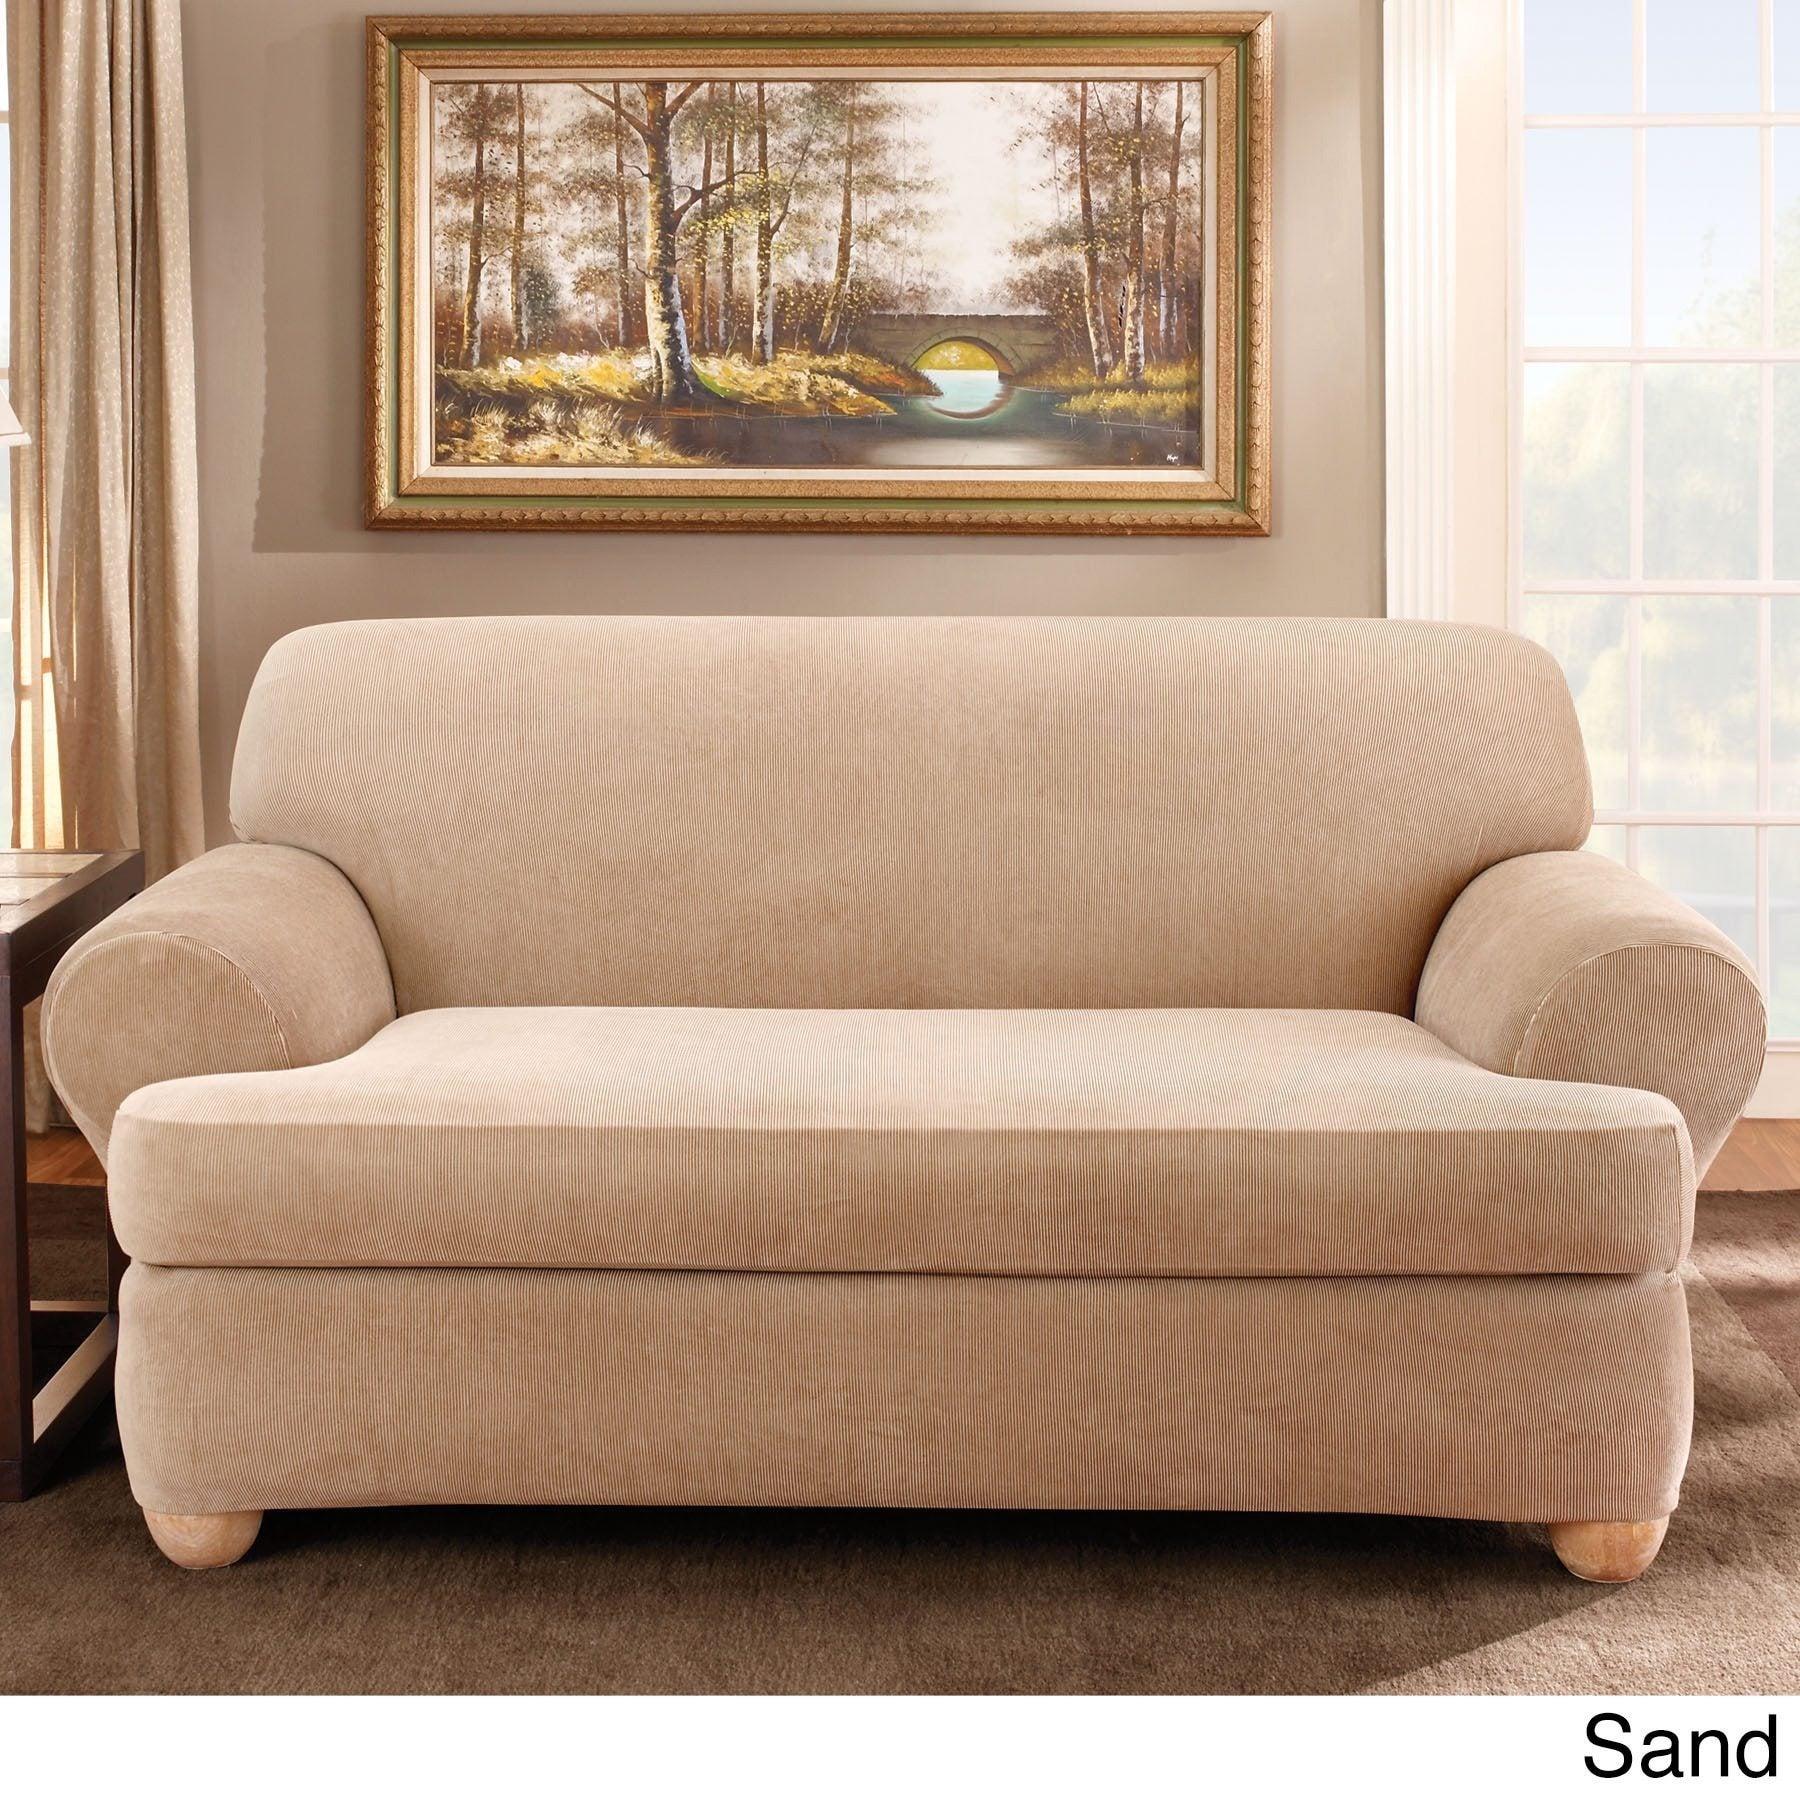 2 Piece T Cushion Sofa Slipcover Home